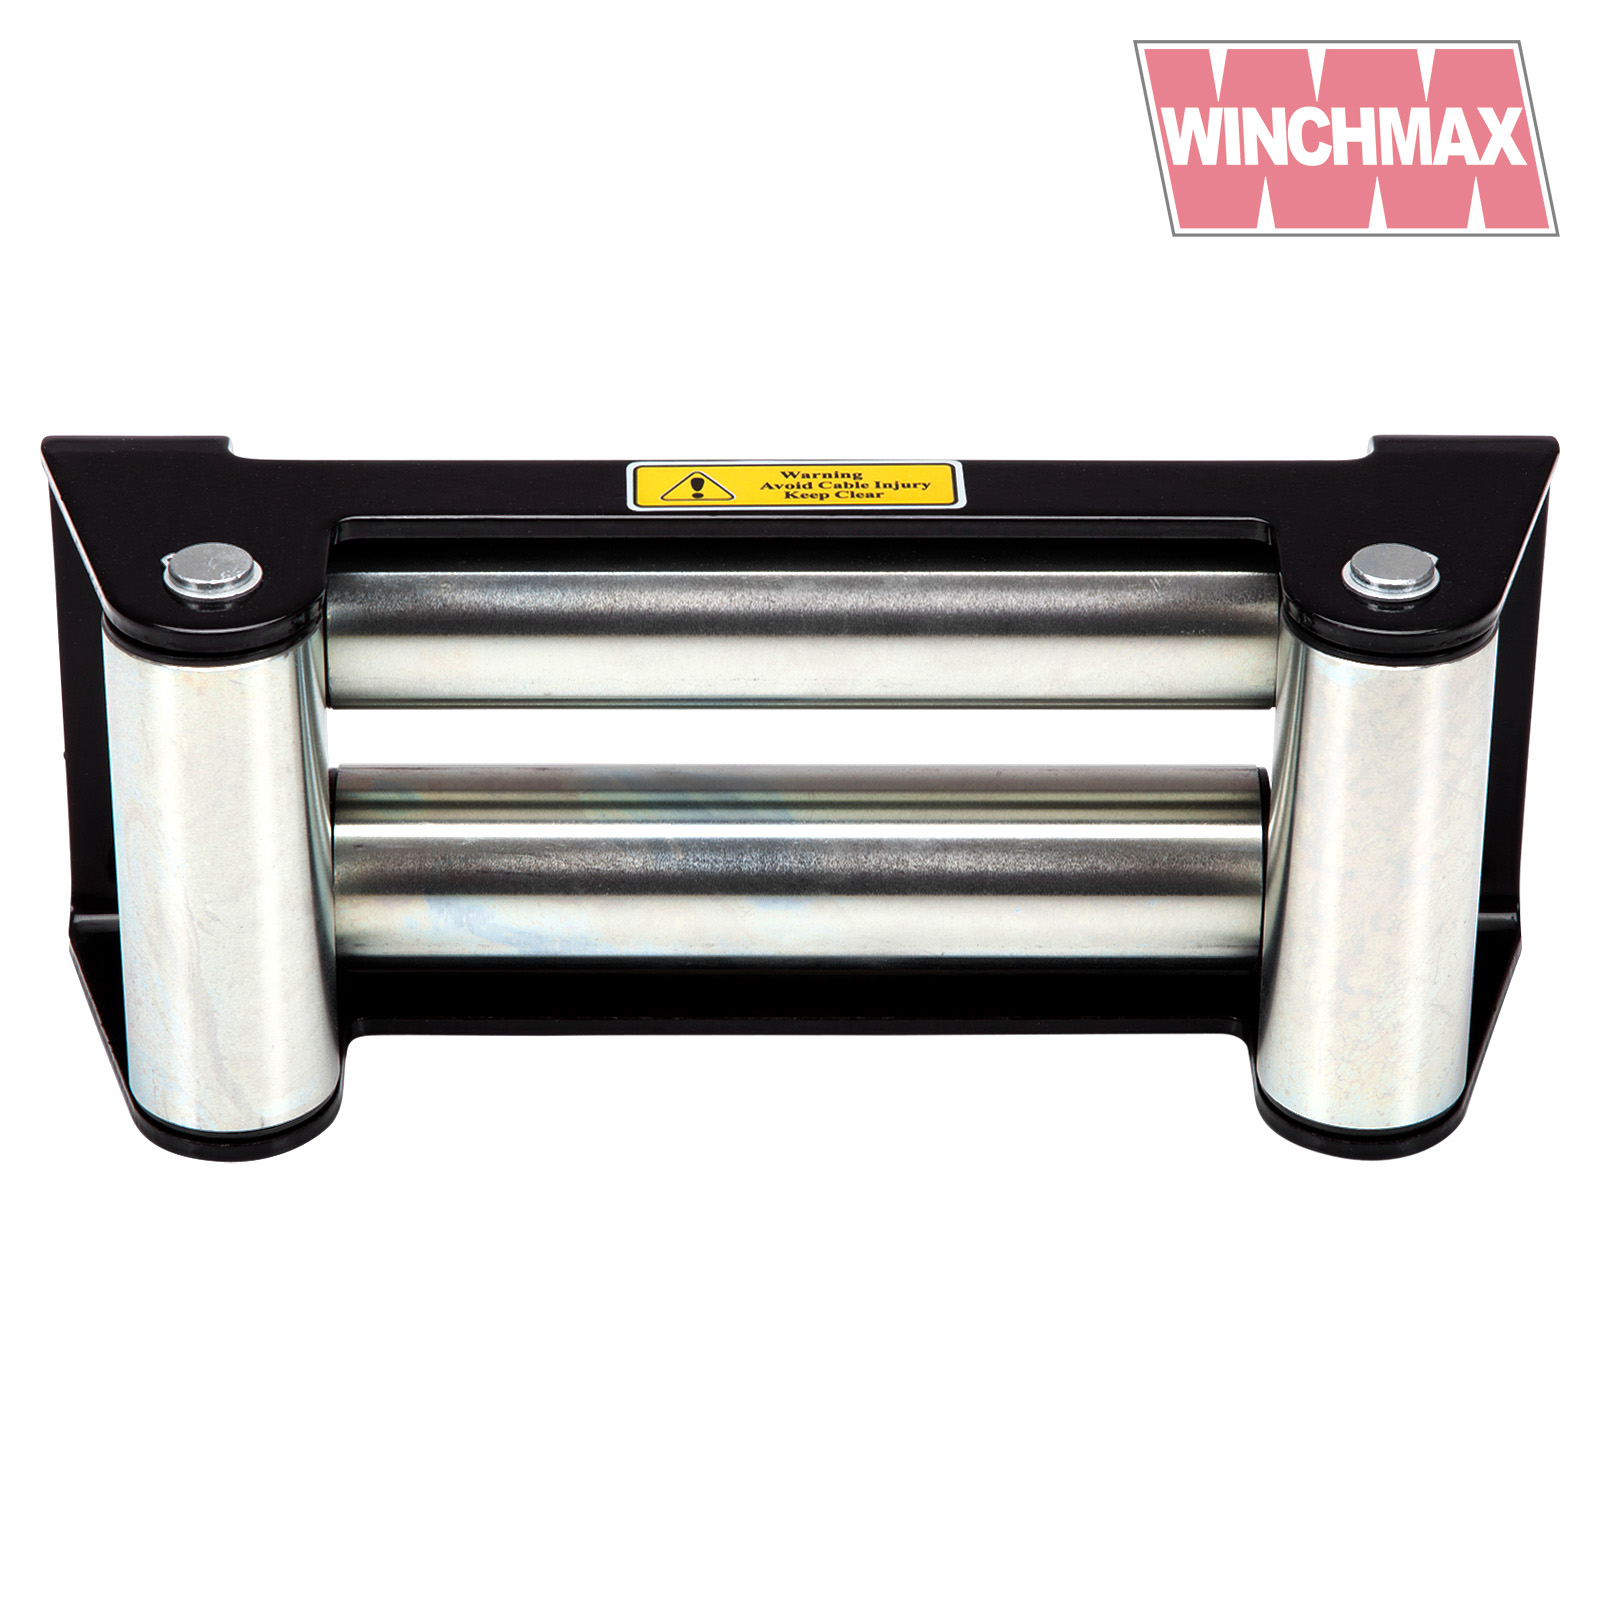 Wmrf winchmax 543